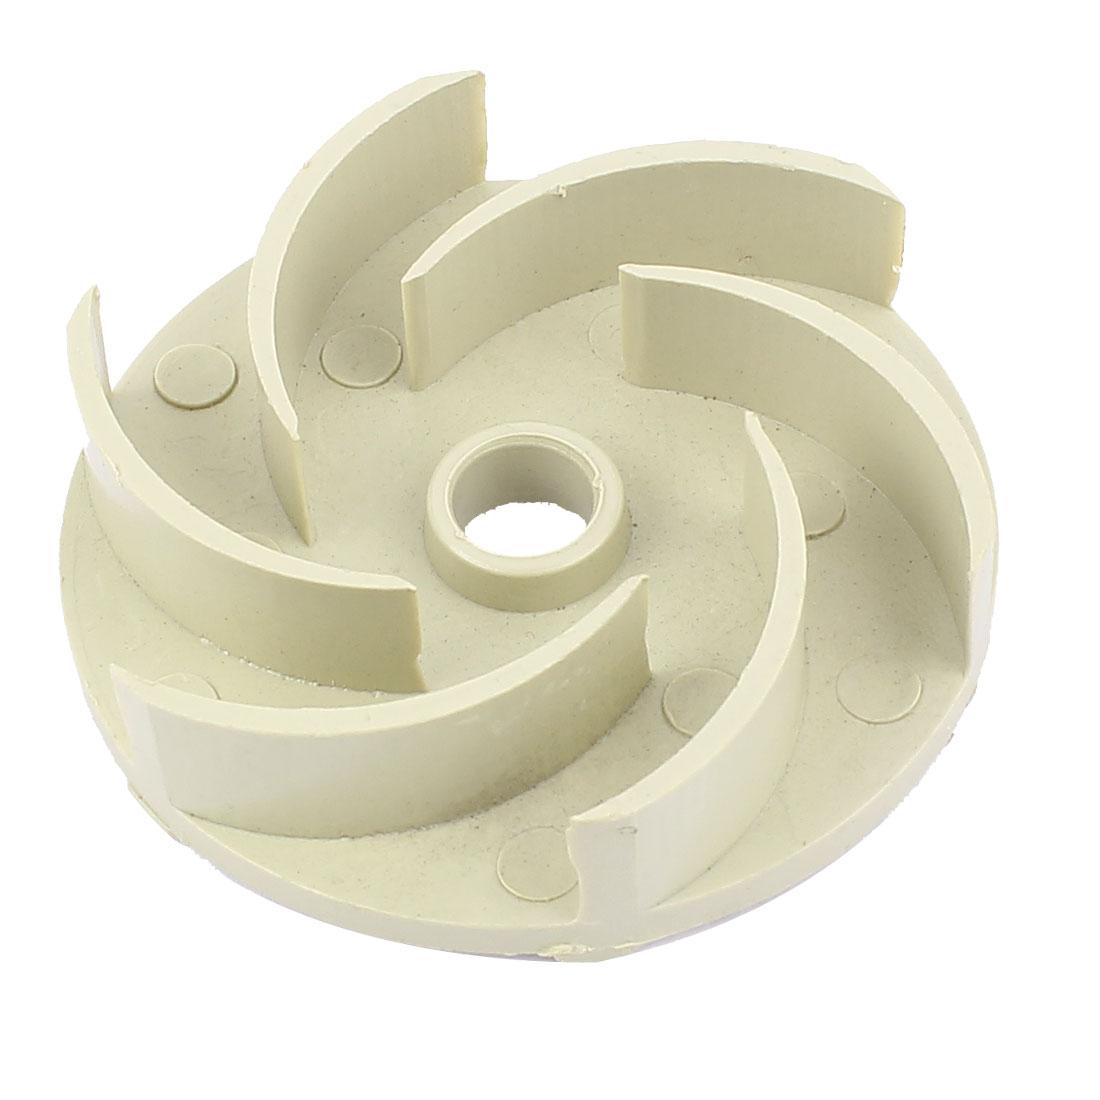 Air Compressor Part 6-Vanes Impeller Motor Fan Vane Wheel